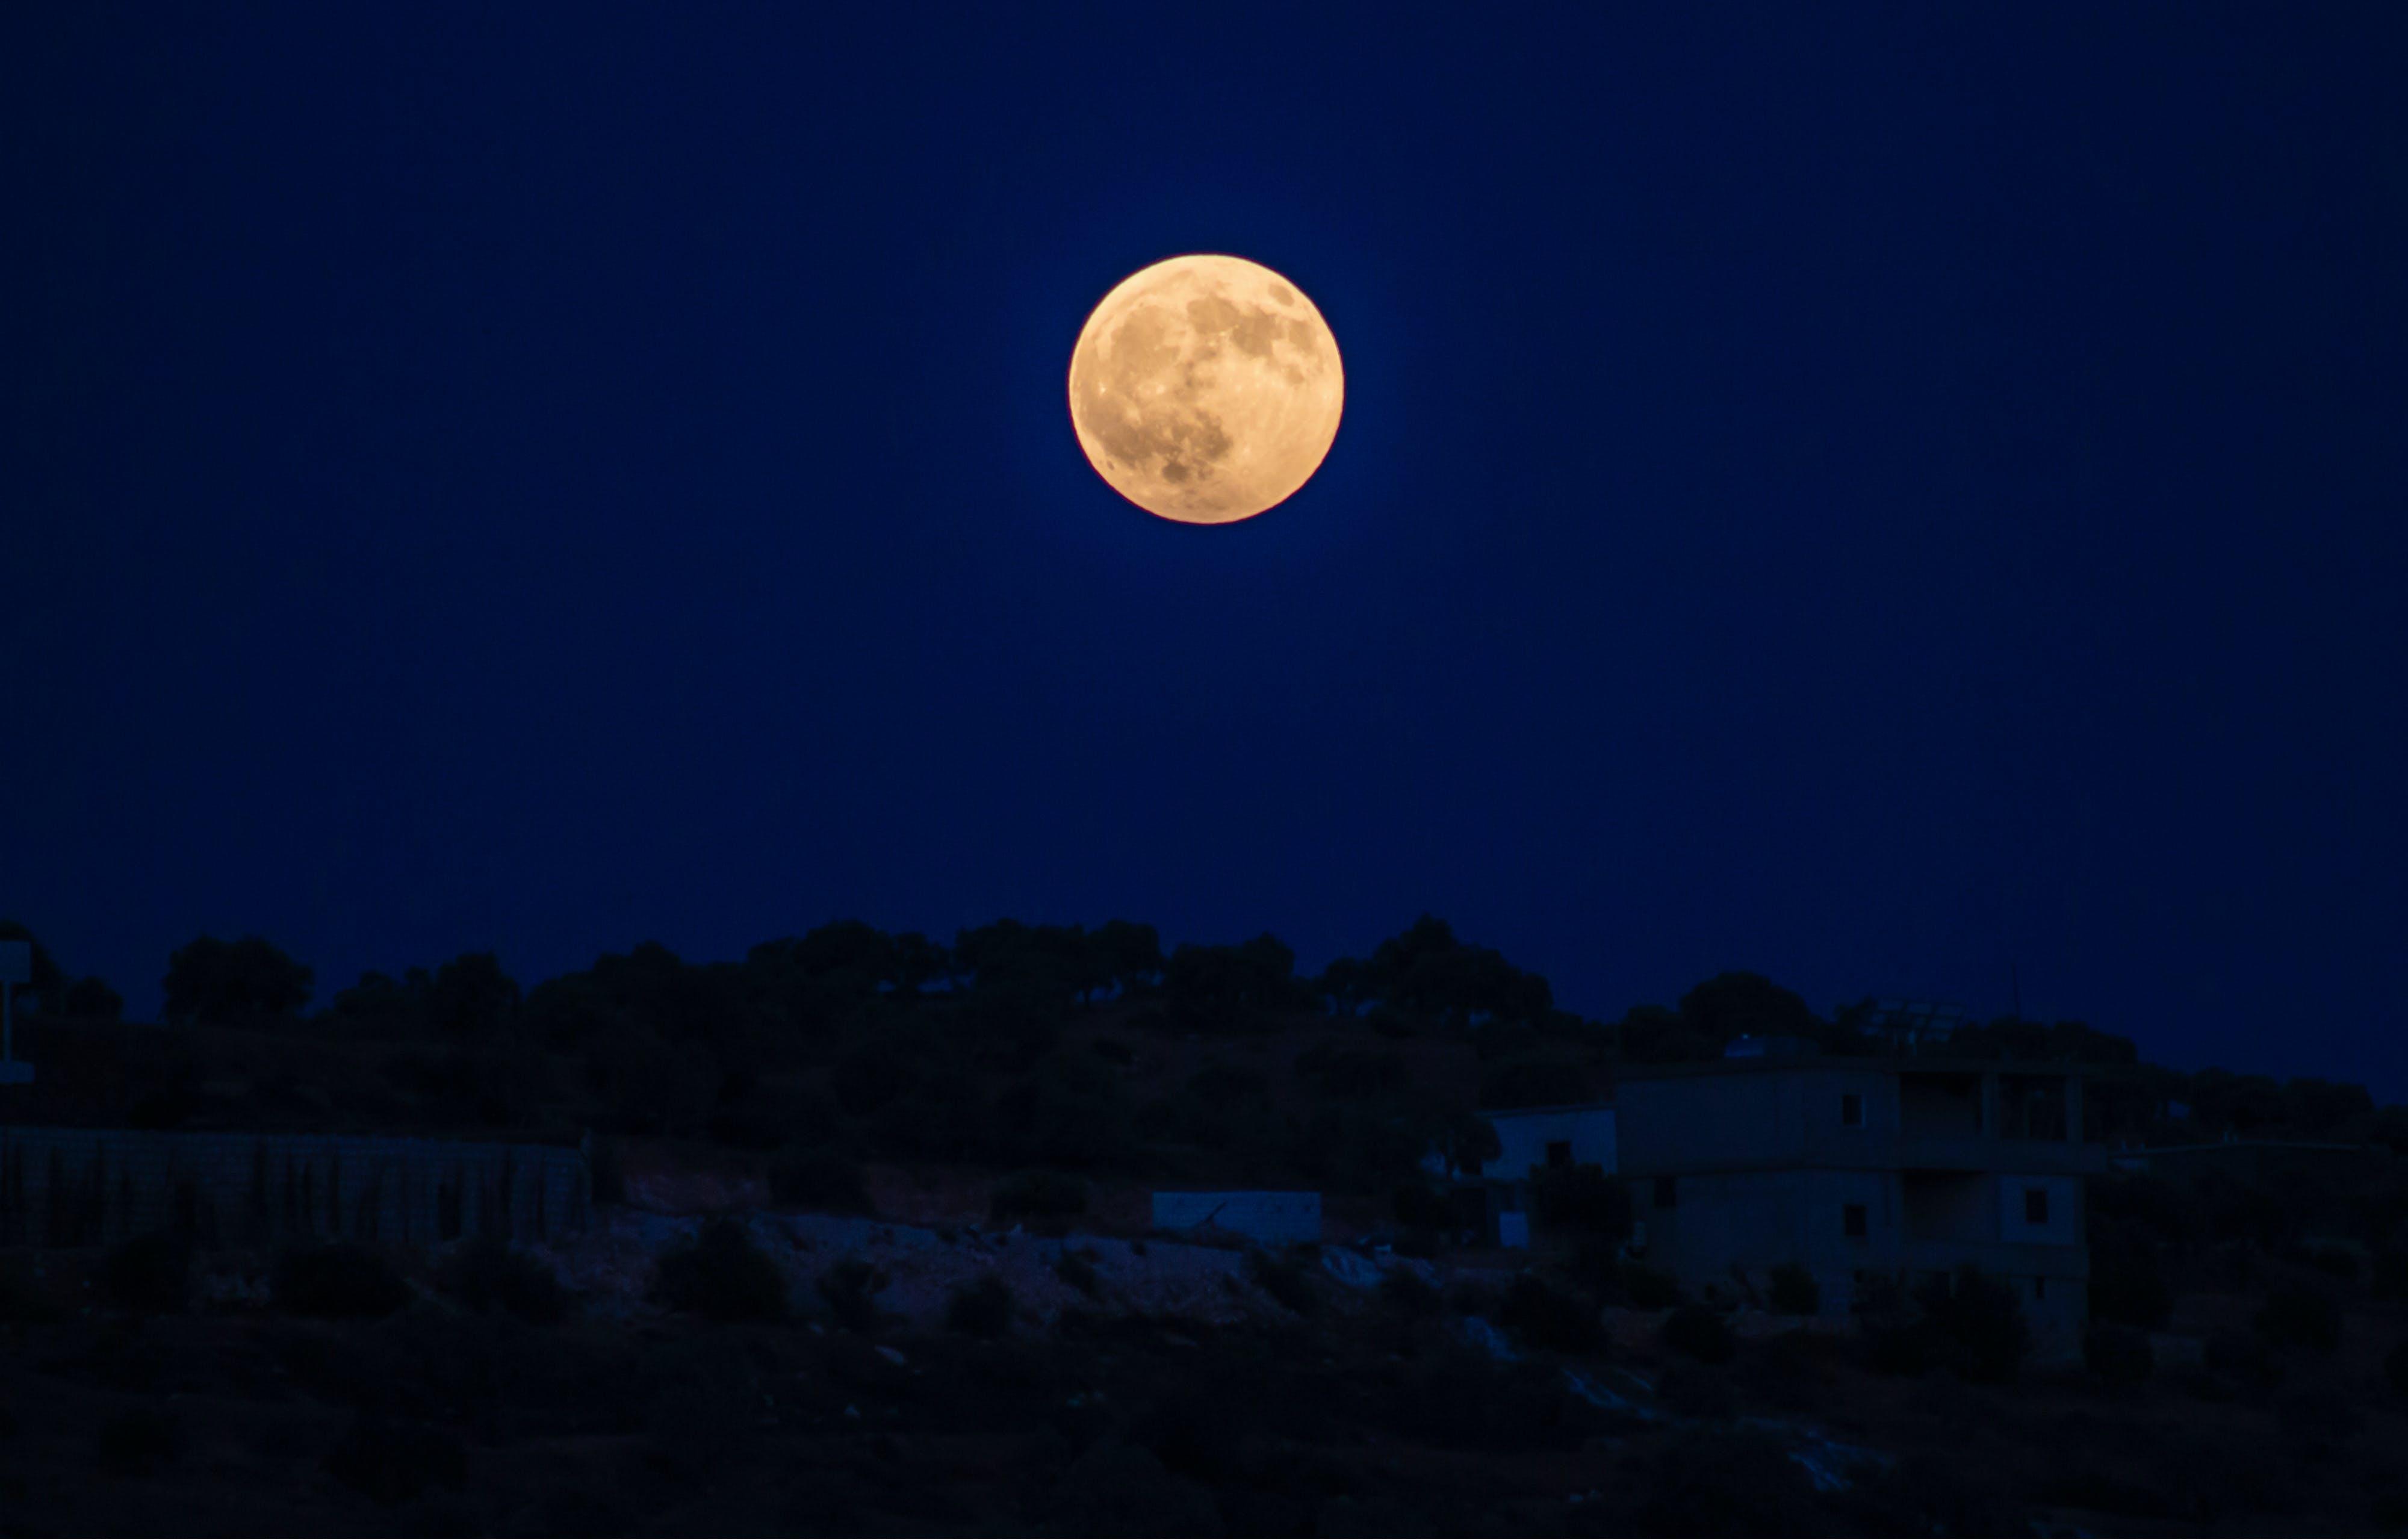 Gratis arkivbilde med astronomi, bygning, daggry, fullmåne